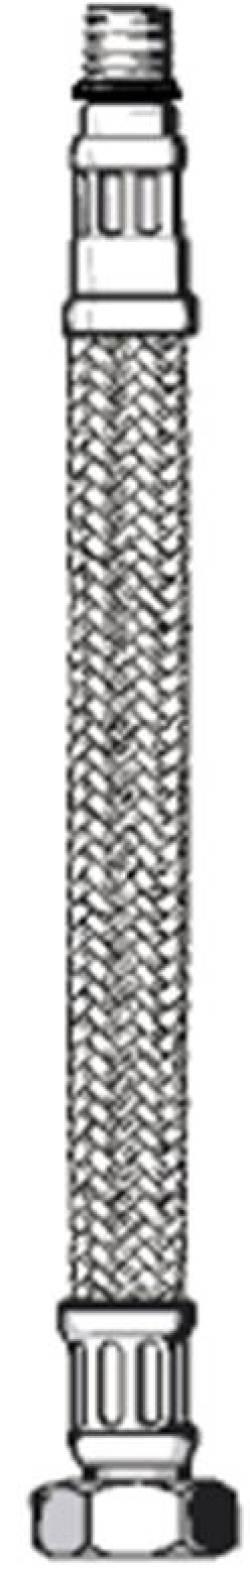 МЕ 5615.3210.50 Meiflex Dn8, М10x1/2ВP, 500mm